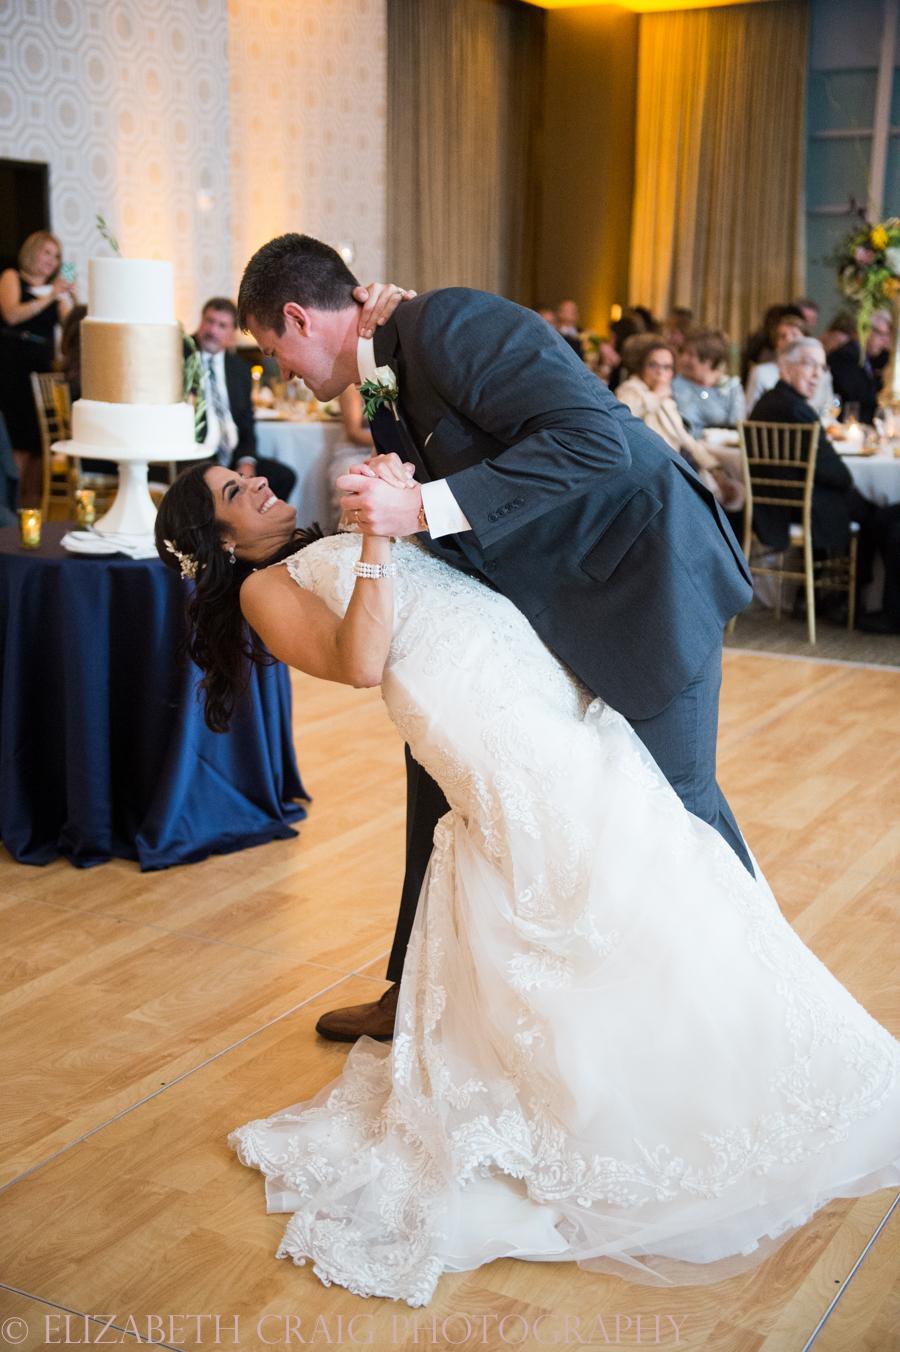 pittsburgh-greek-weddings-fairmont-weddings-receptions-elizabeth-craig-photohgraphy-023